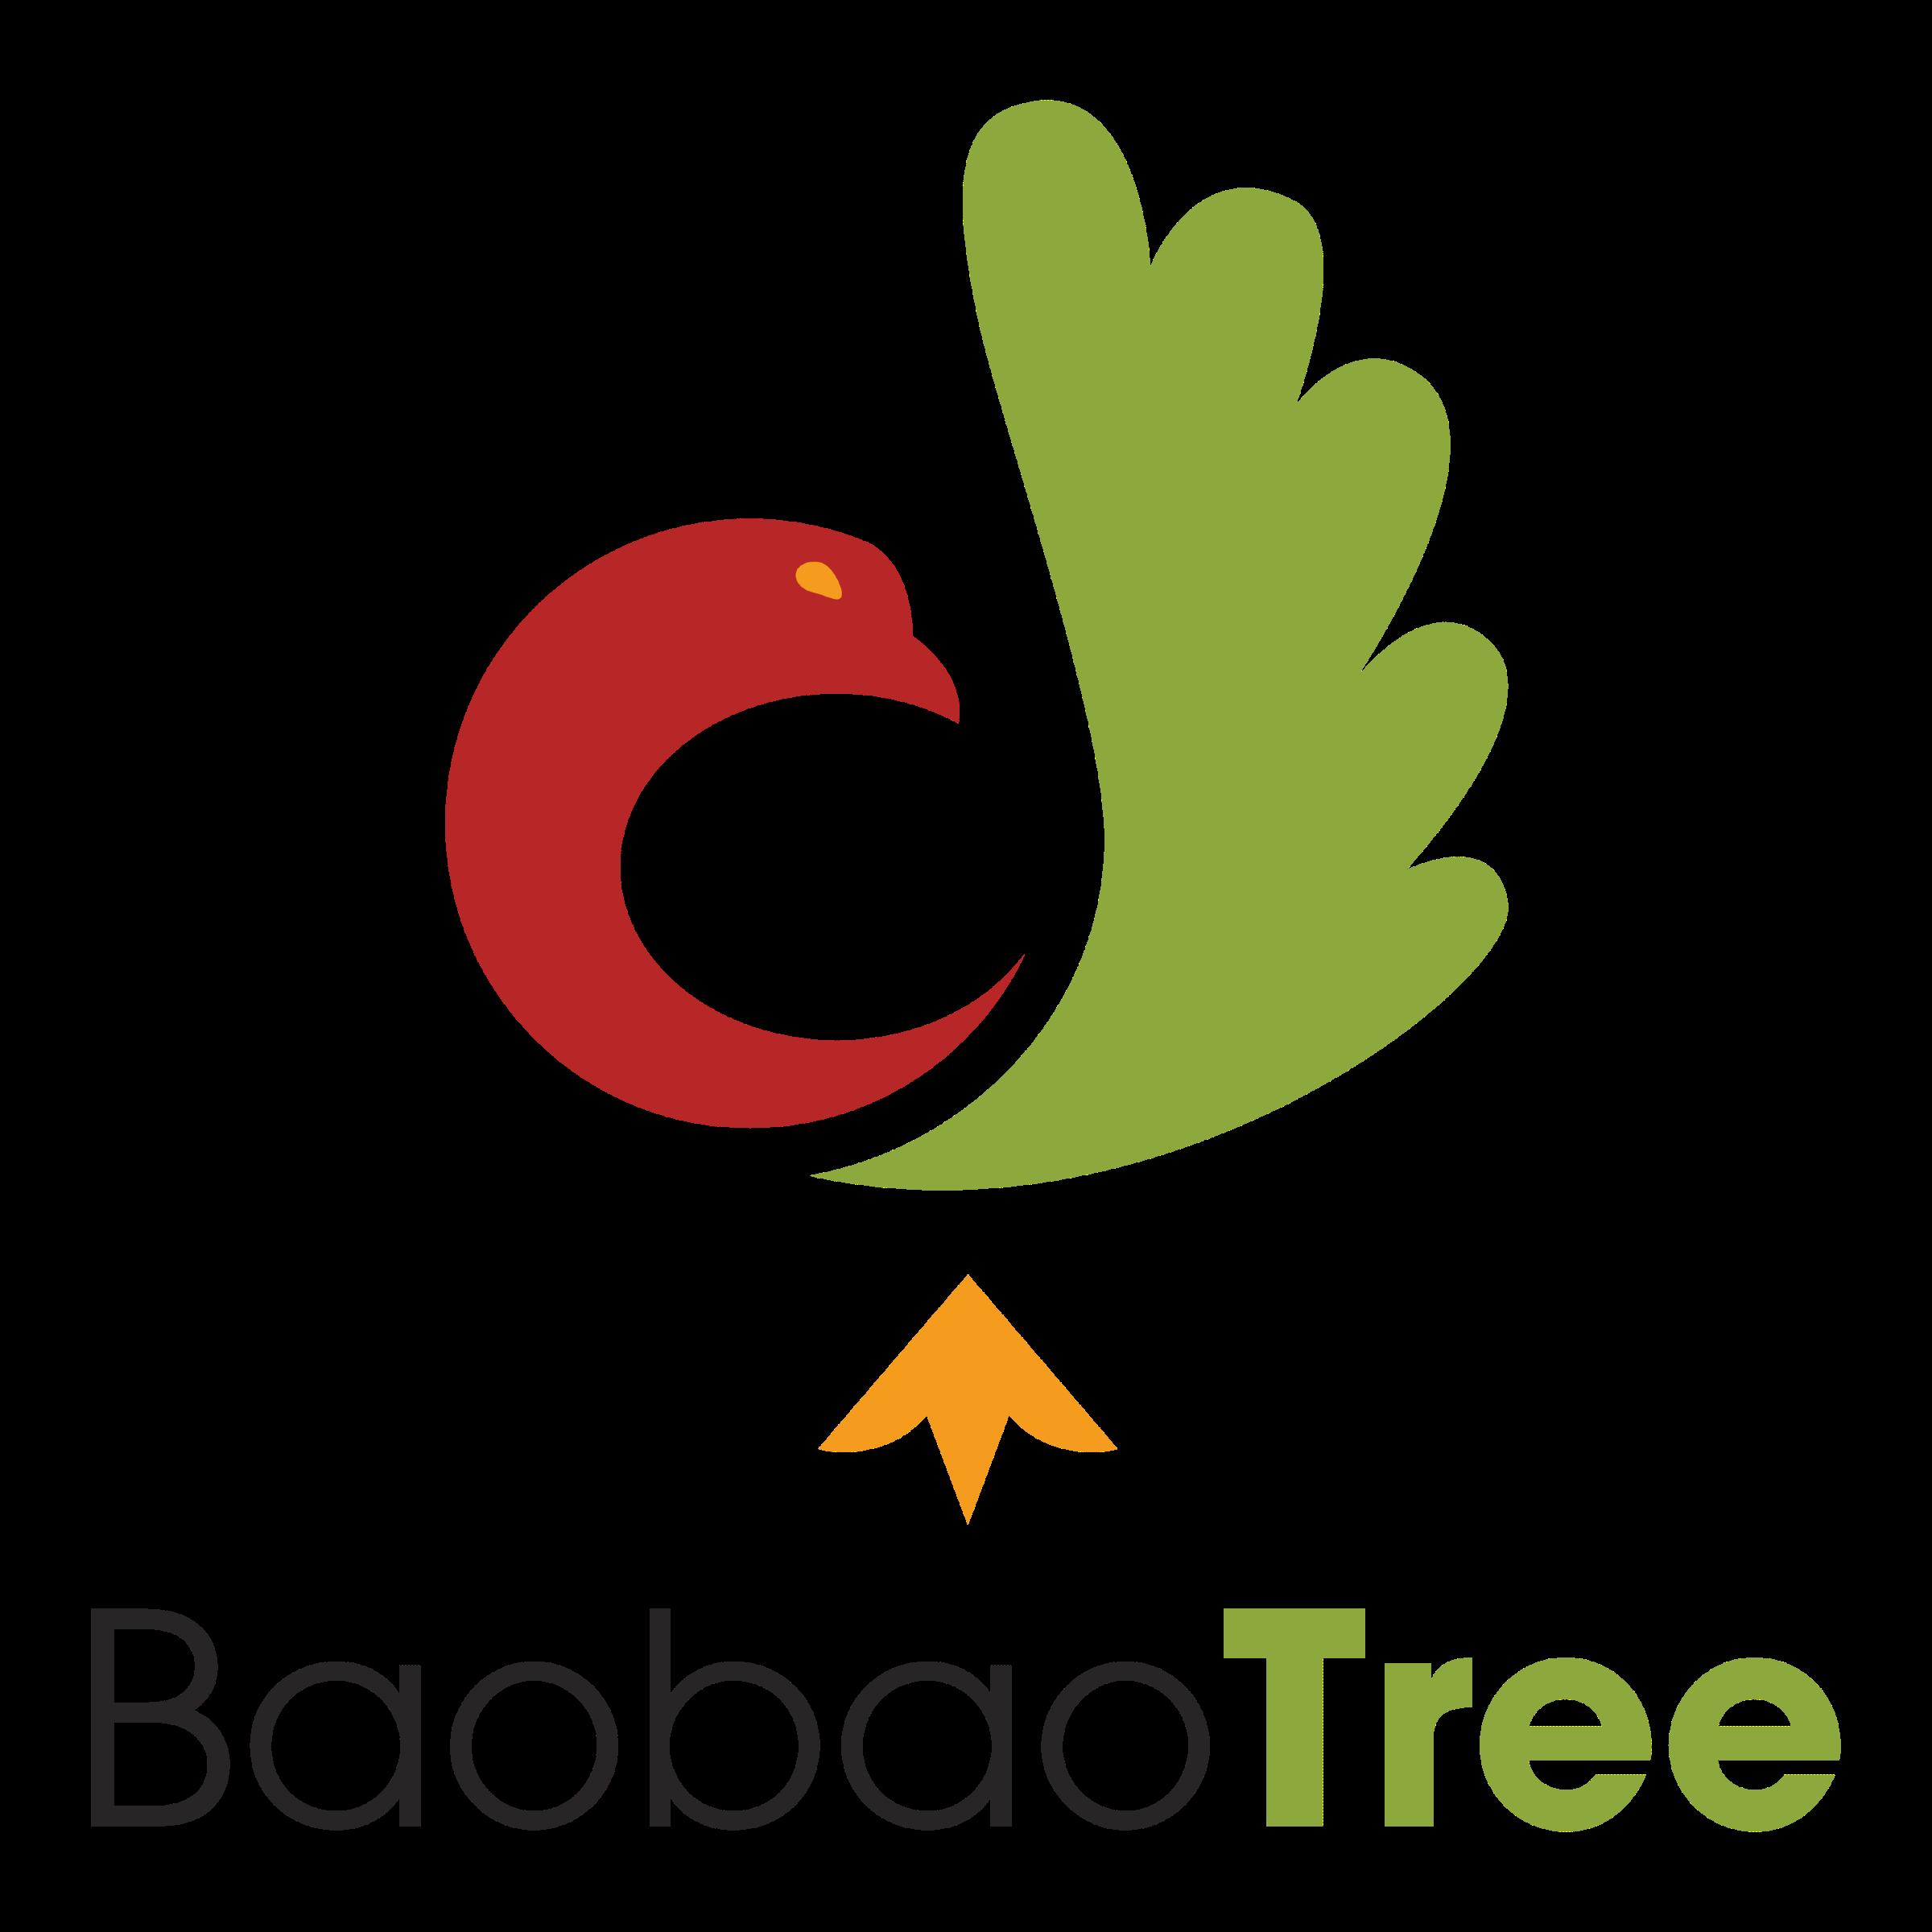 BaobaoTree